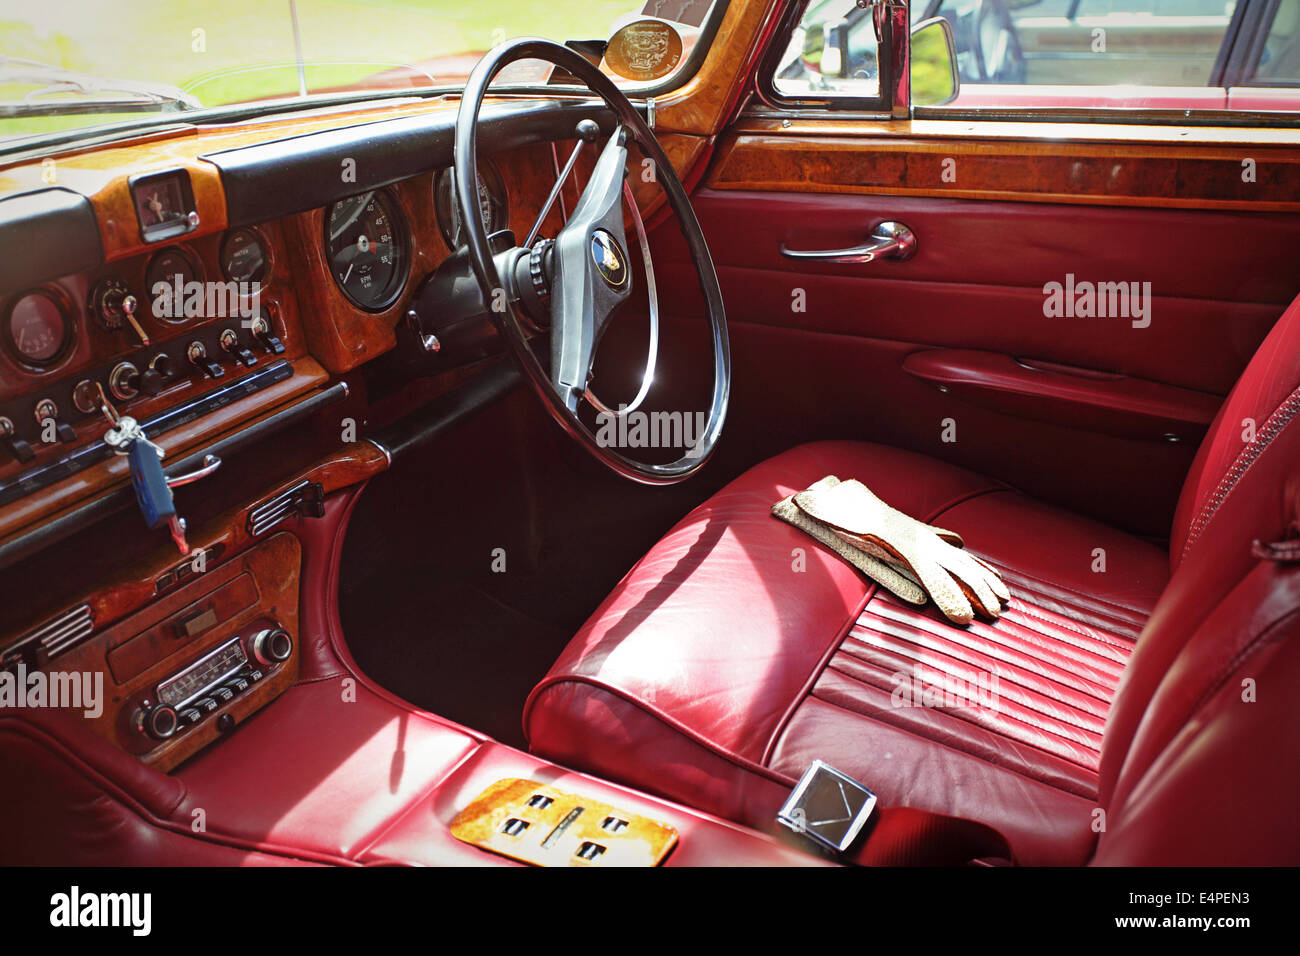 Vintage Jaguar Interior, Dashboard And Steering Wheel